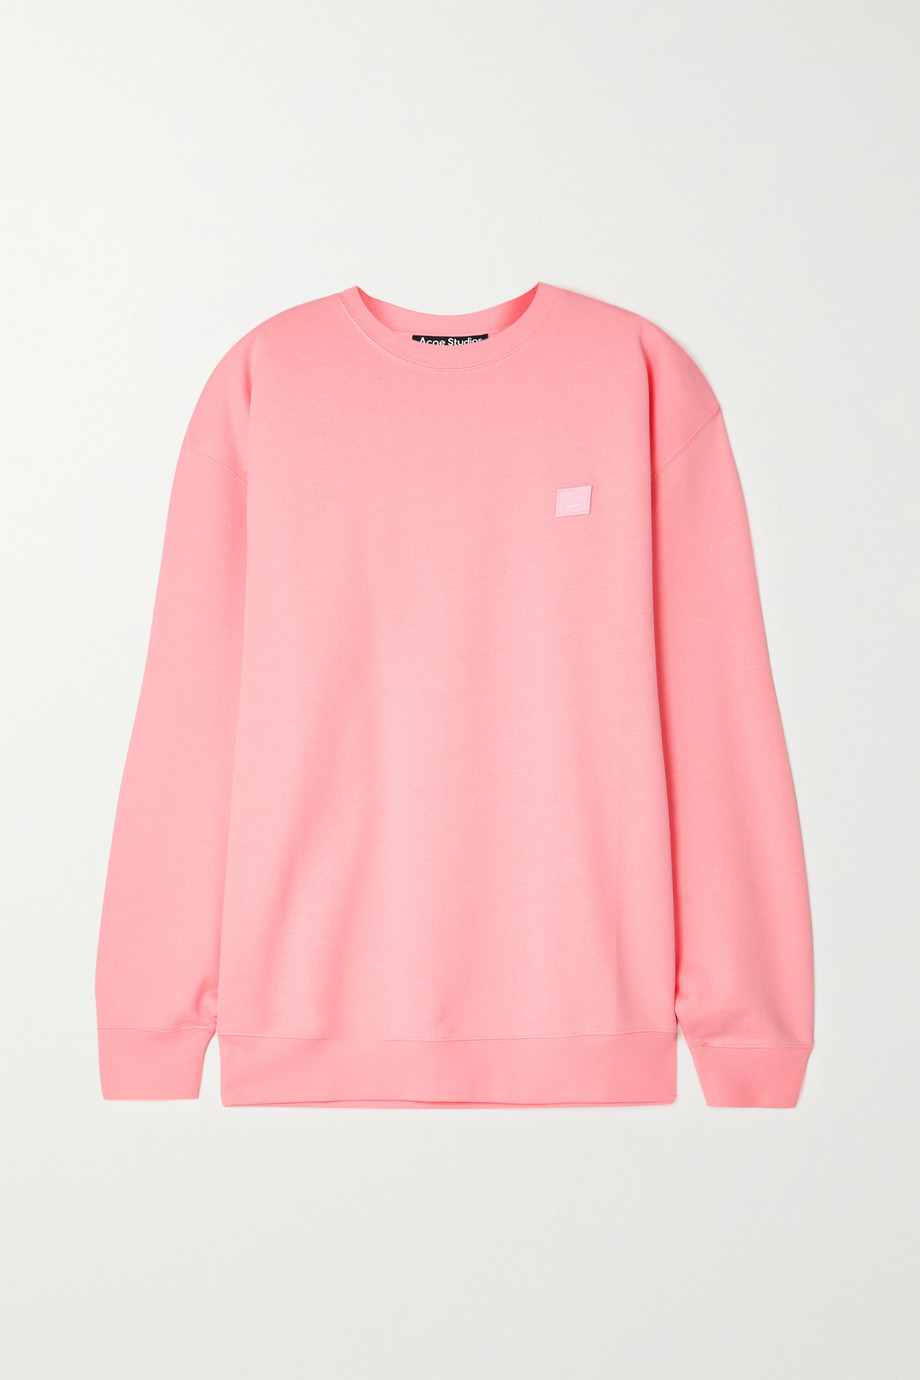 Acne Studios Forba Face oversized appliquéd organic cotton-jersey sweatshirt